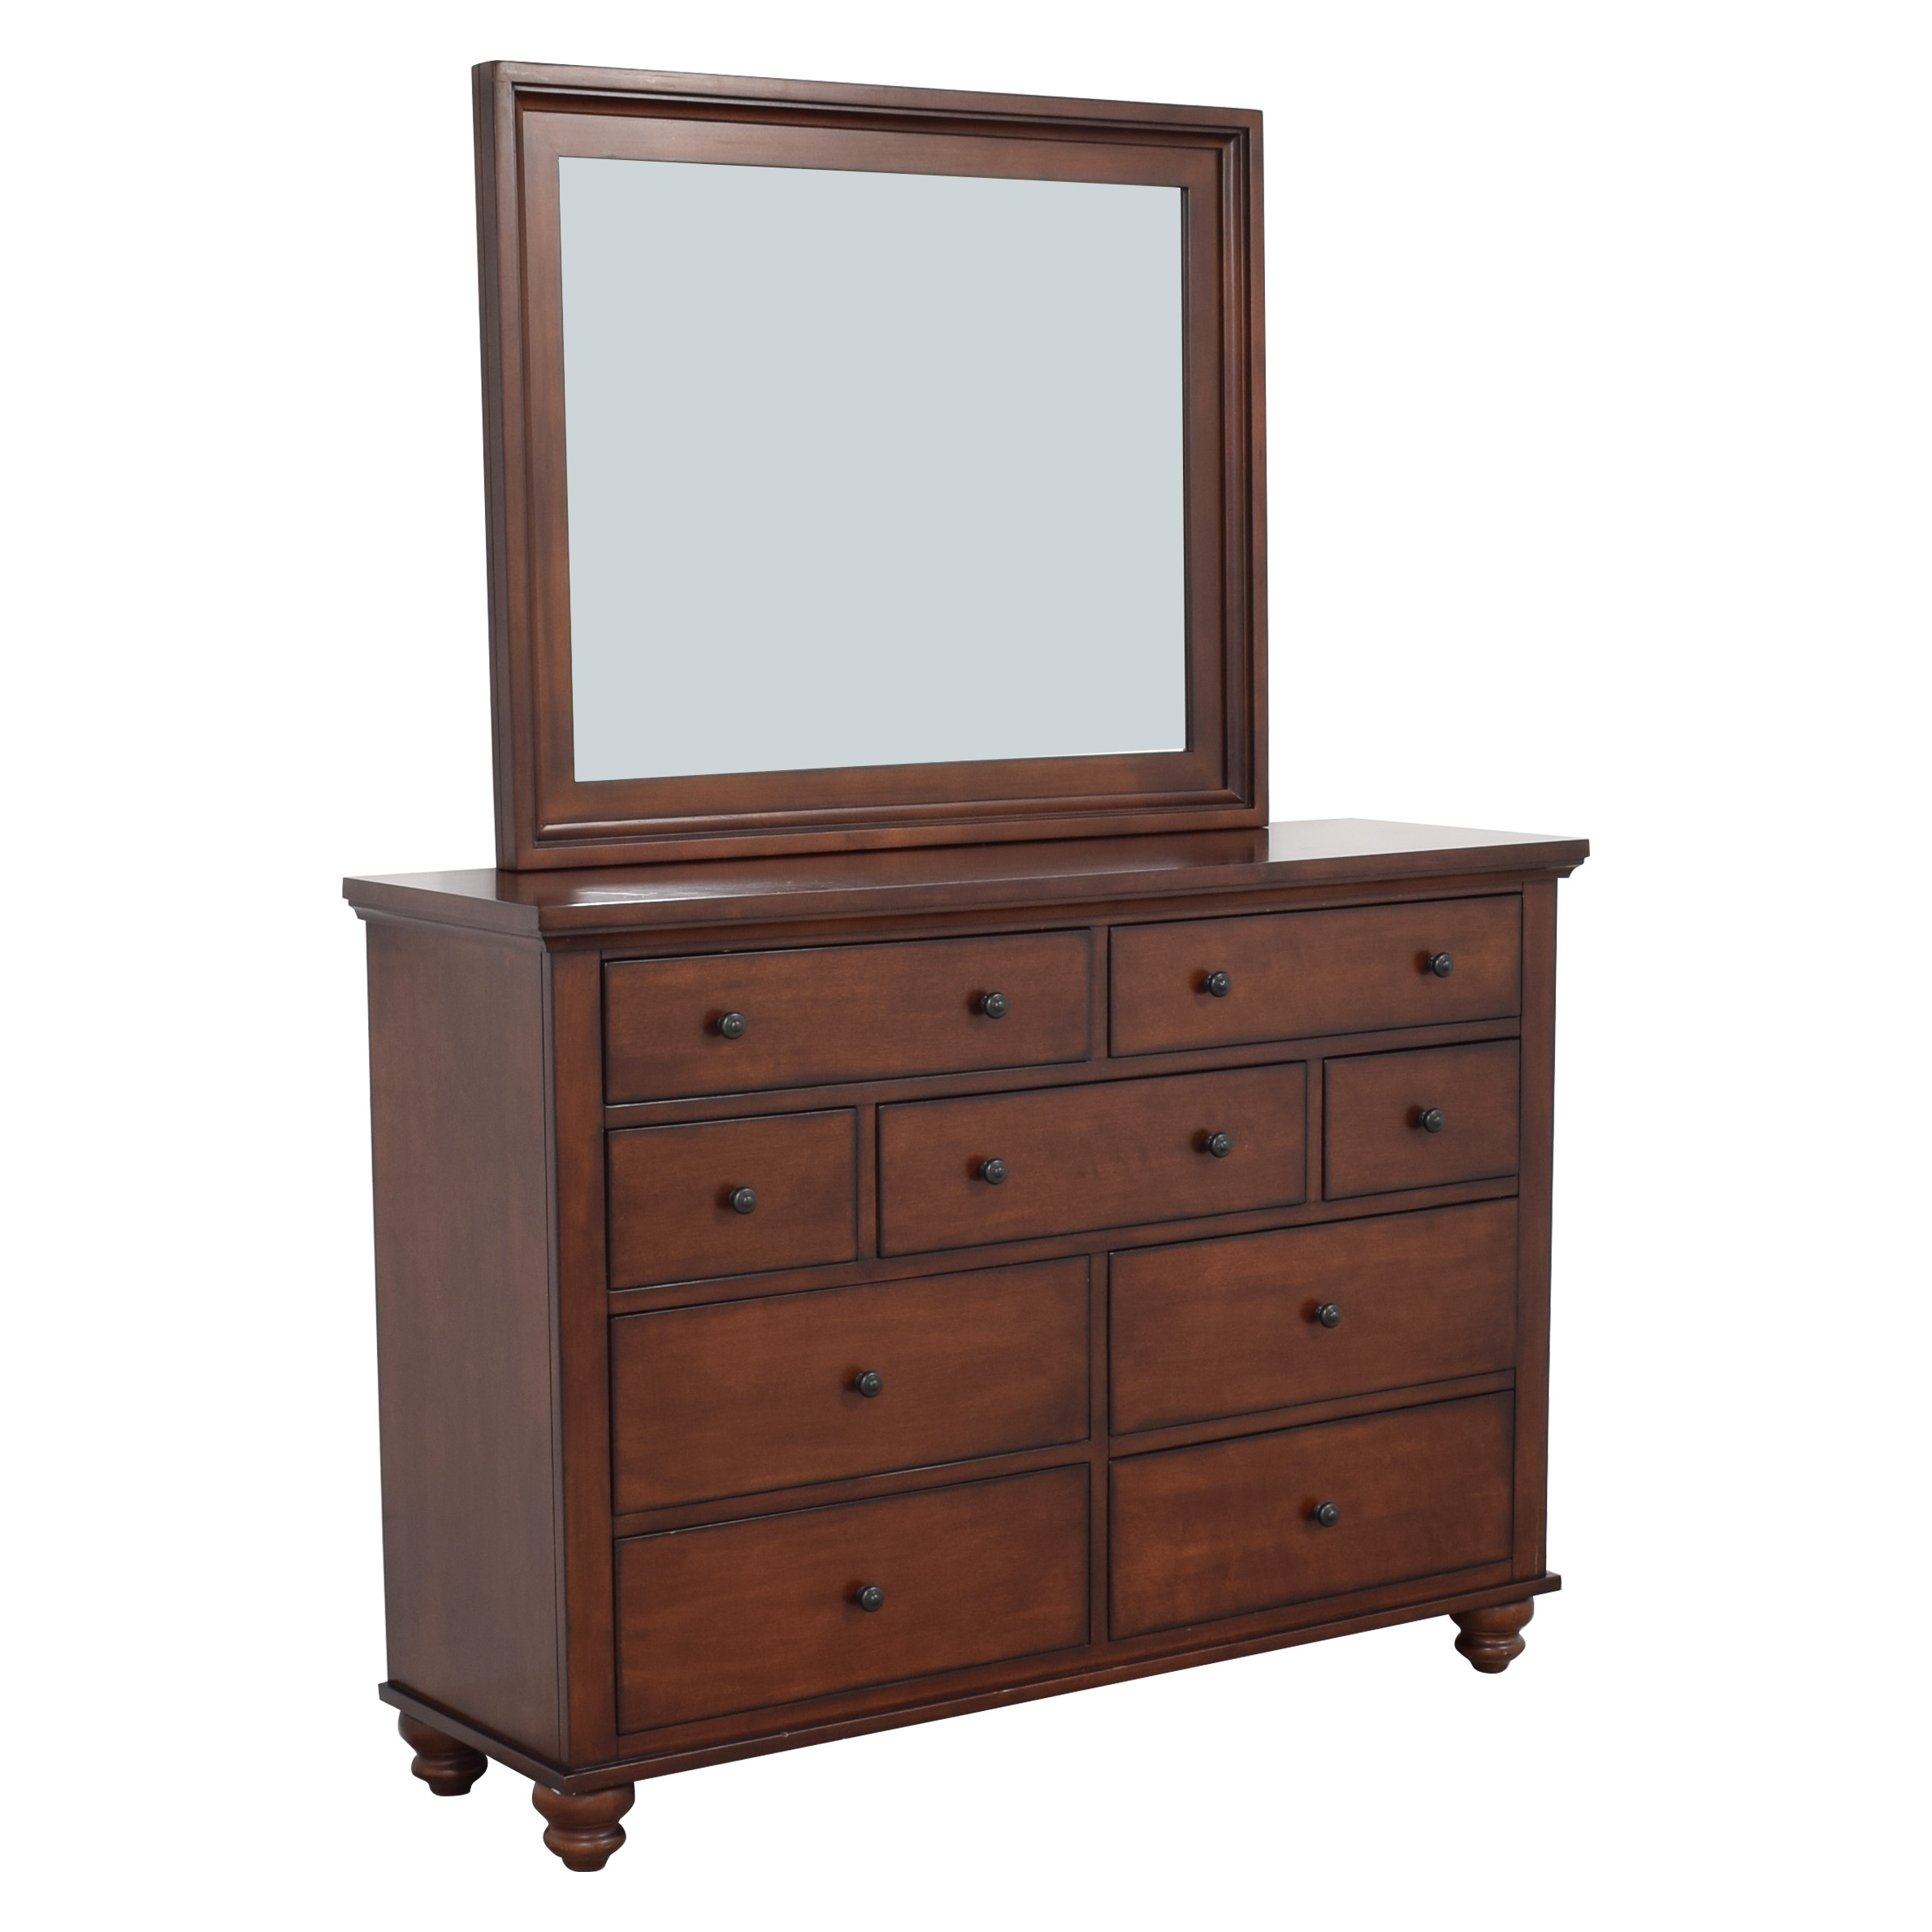 Aspen Home Cambridge Dresser with Mirror aspenhome